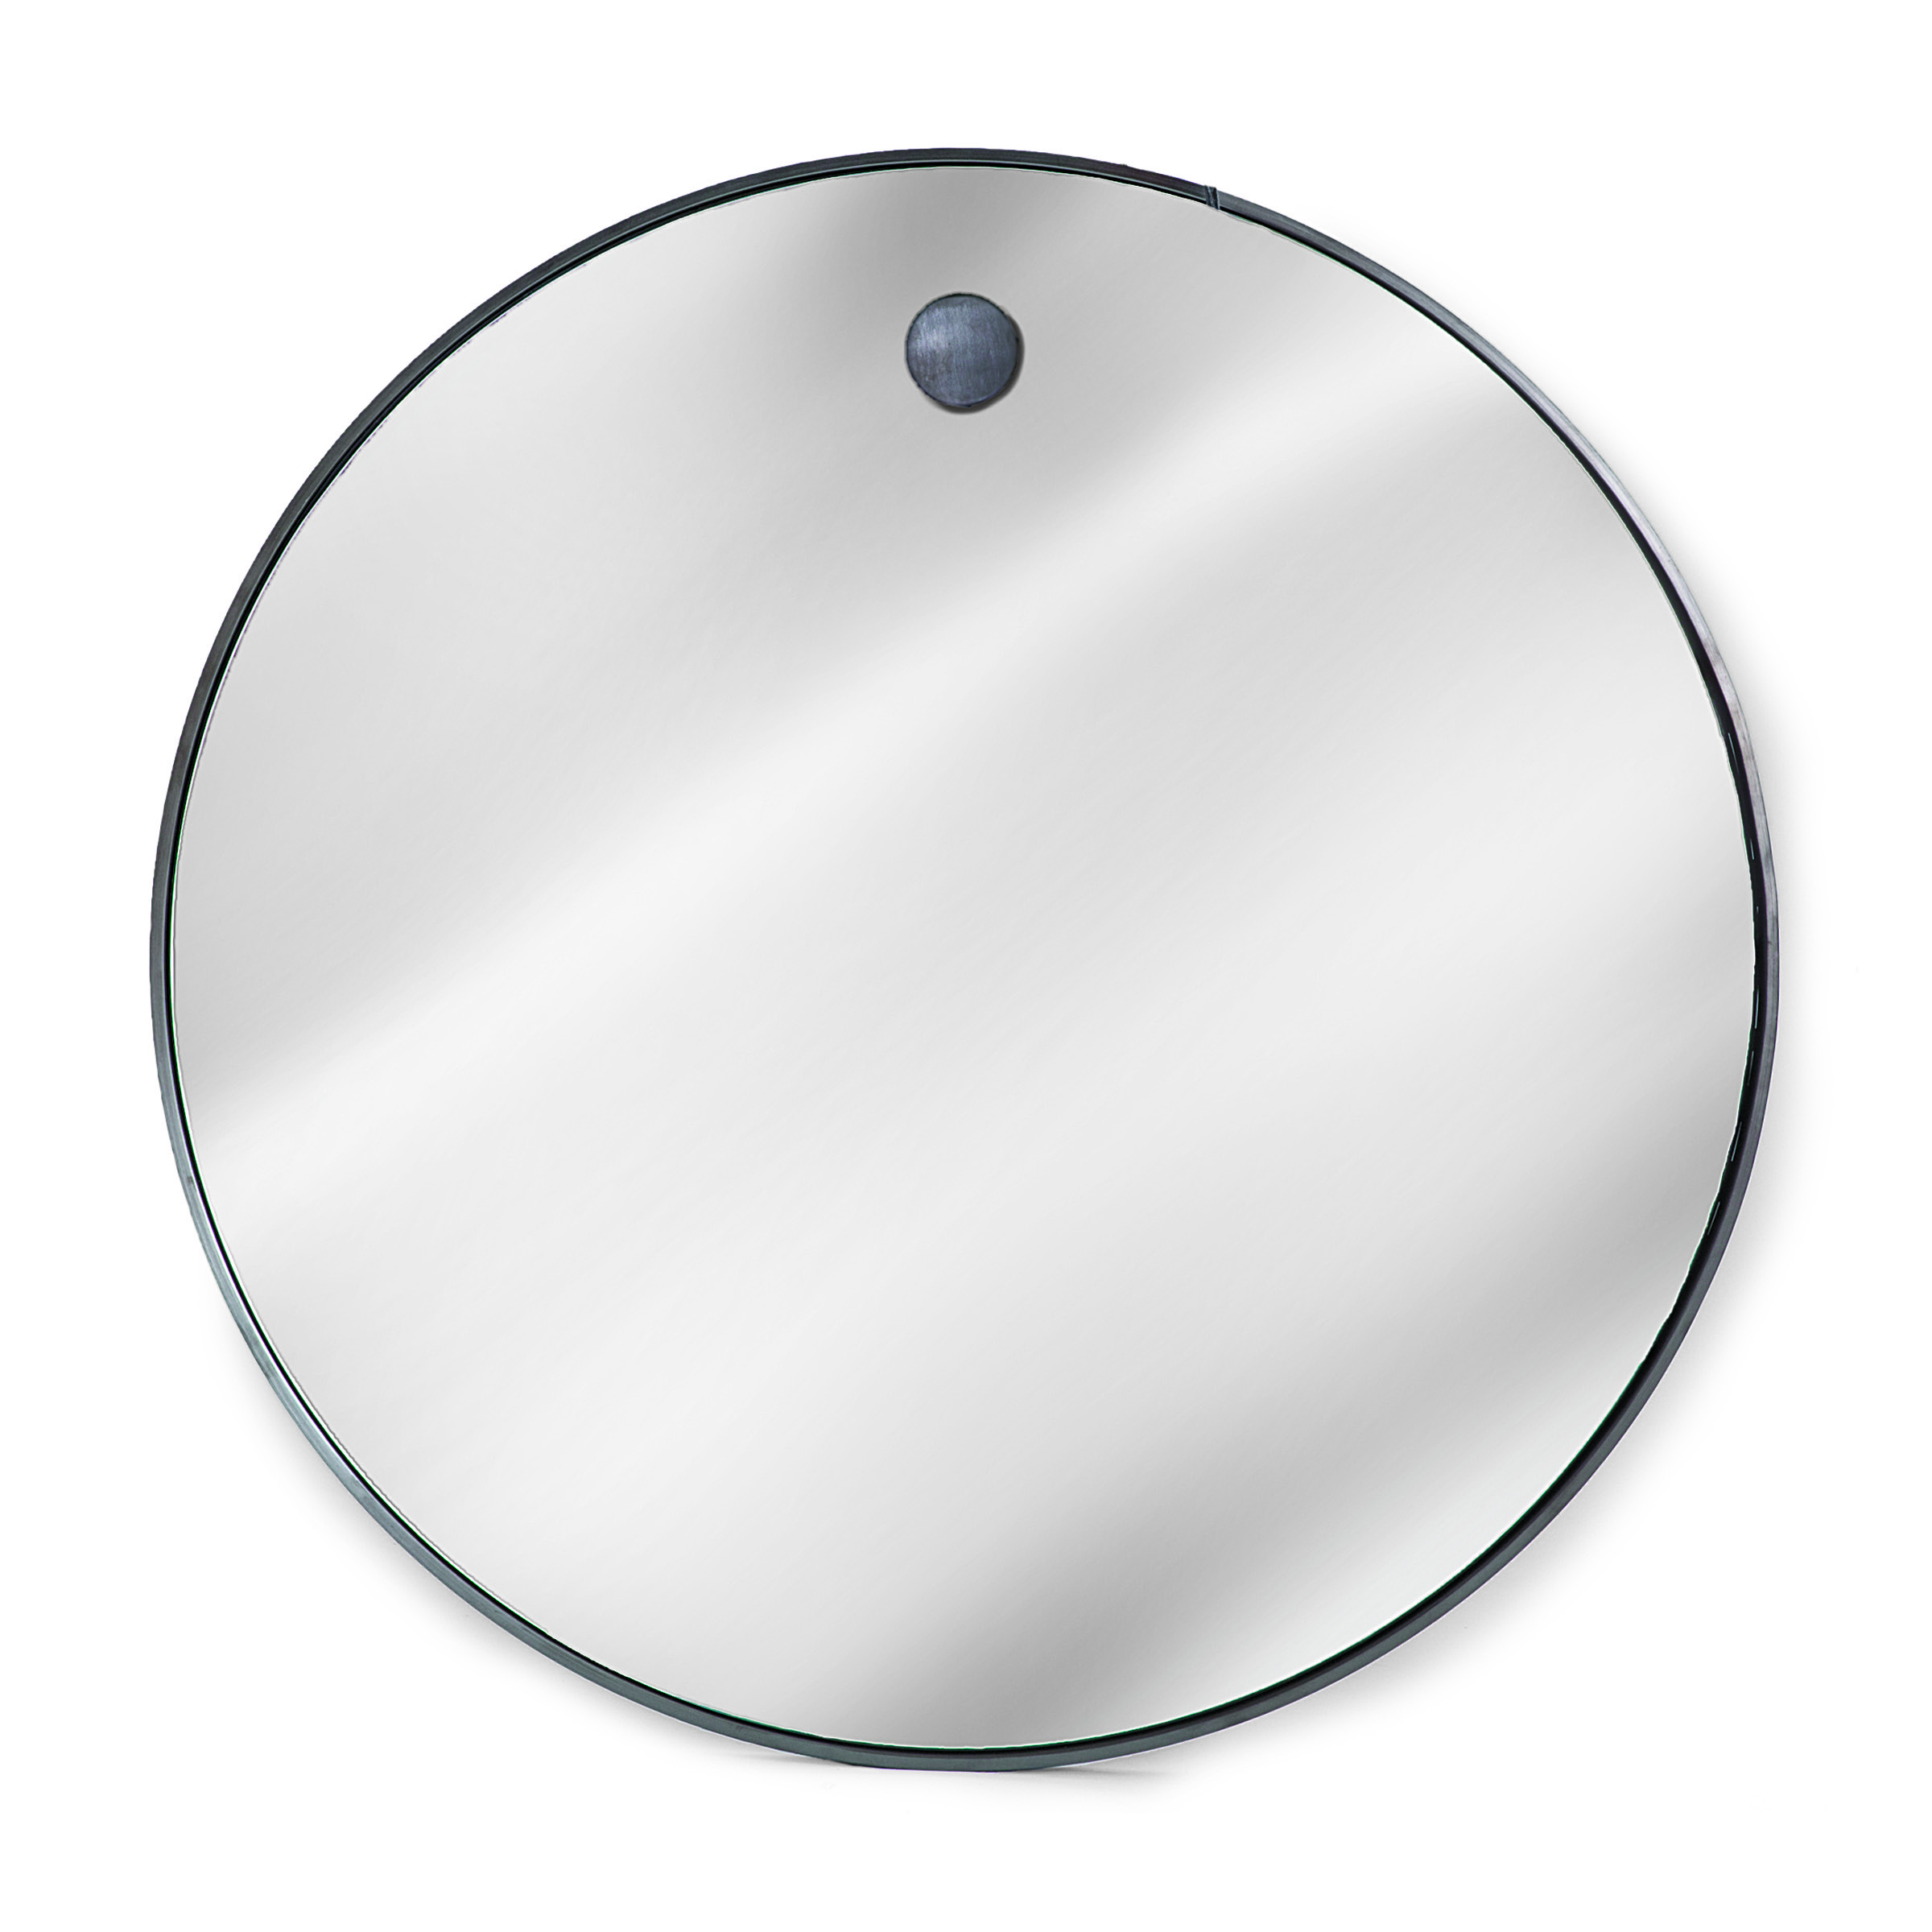 Hanging circular mirror from Regina Andrew Design